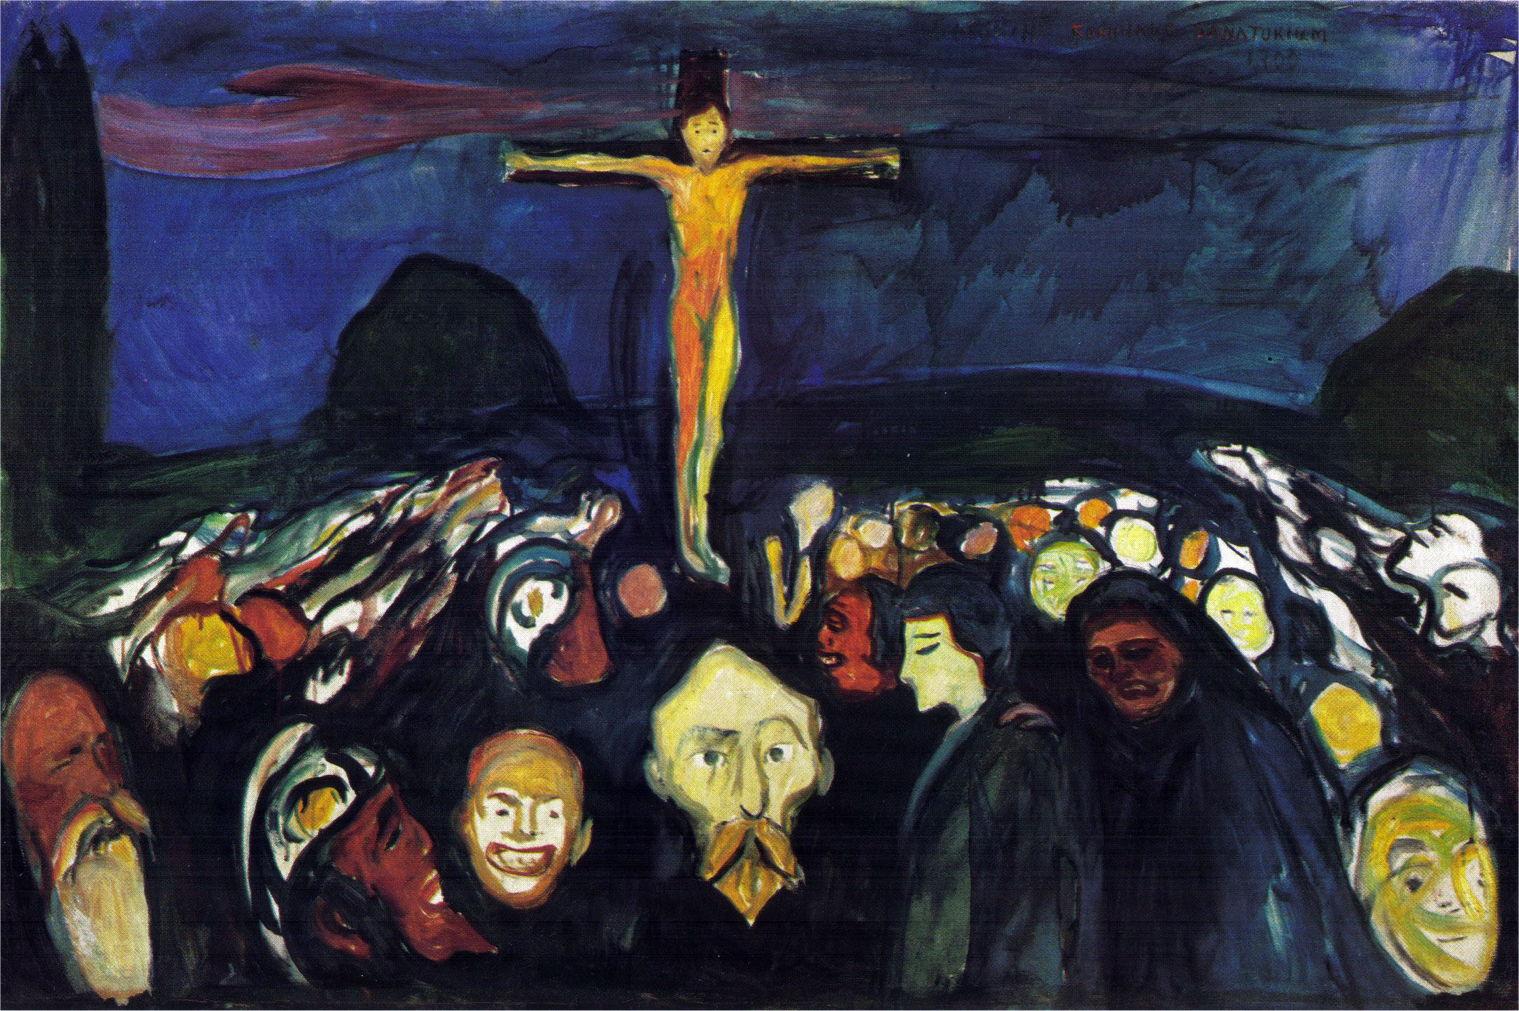 The Frieze of Life Edvard Munch